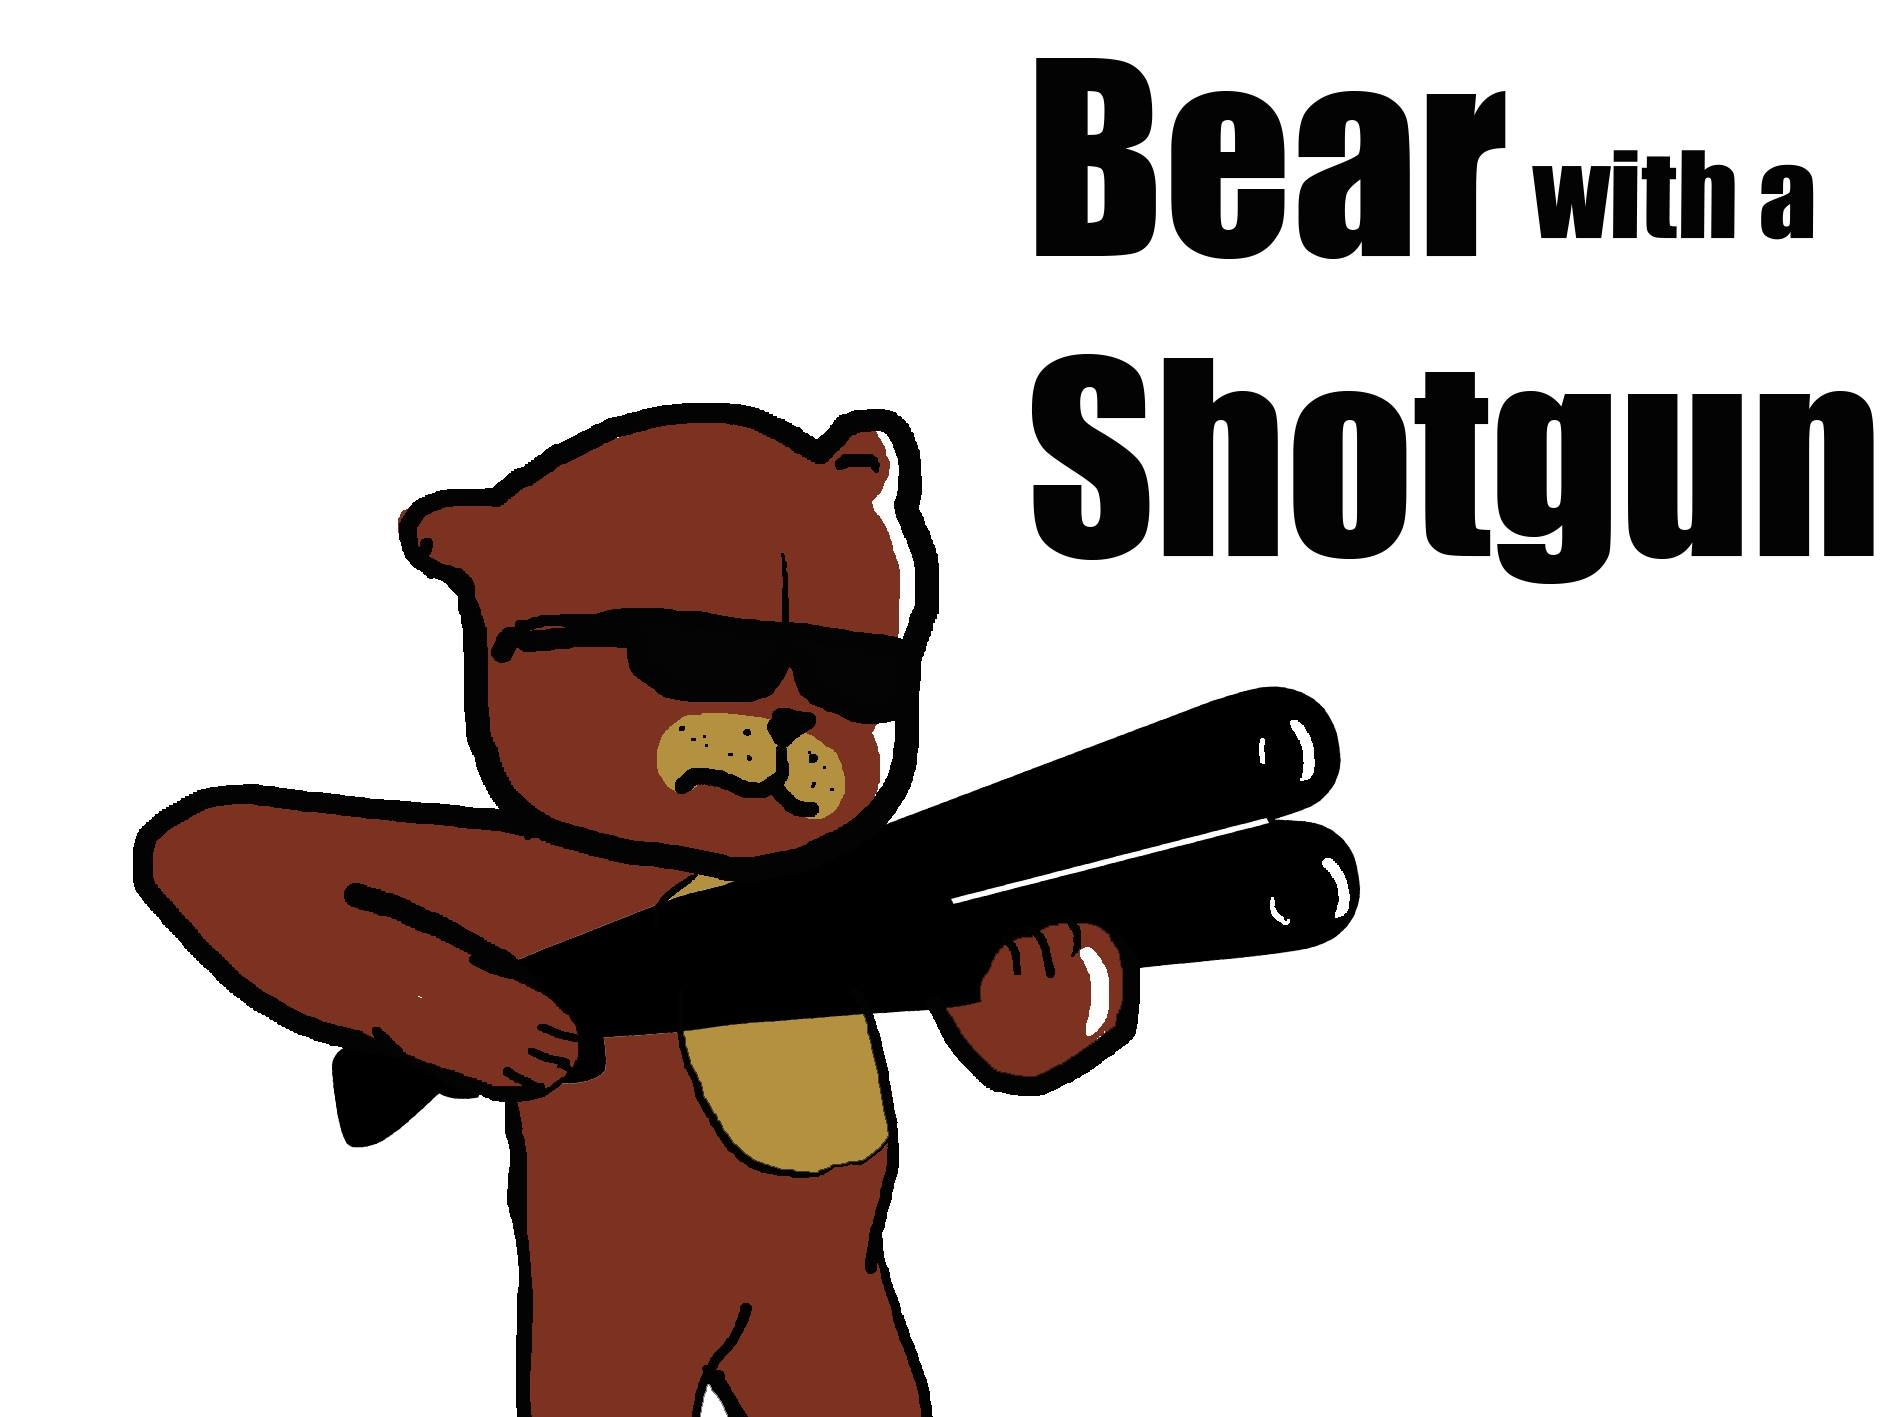 Bear with a shotgun